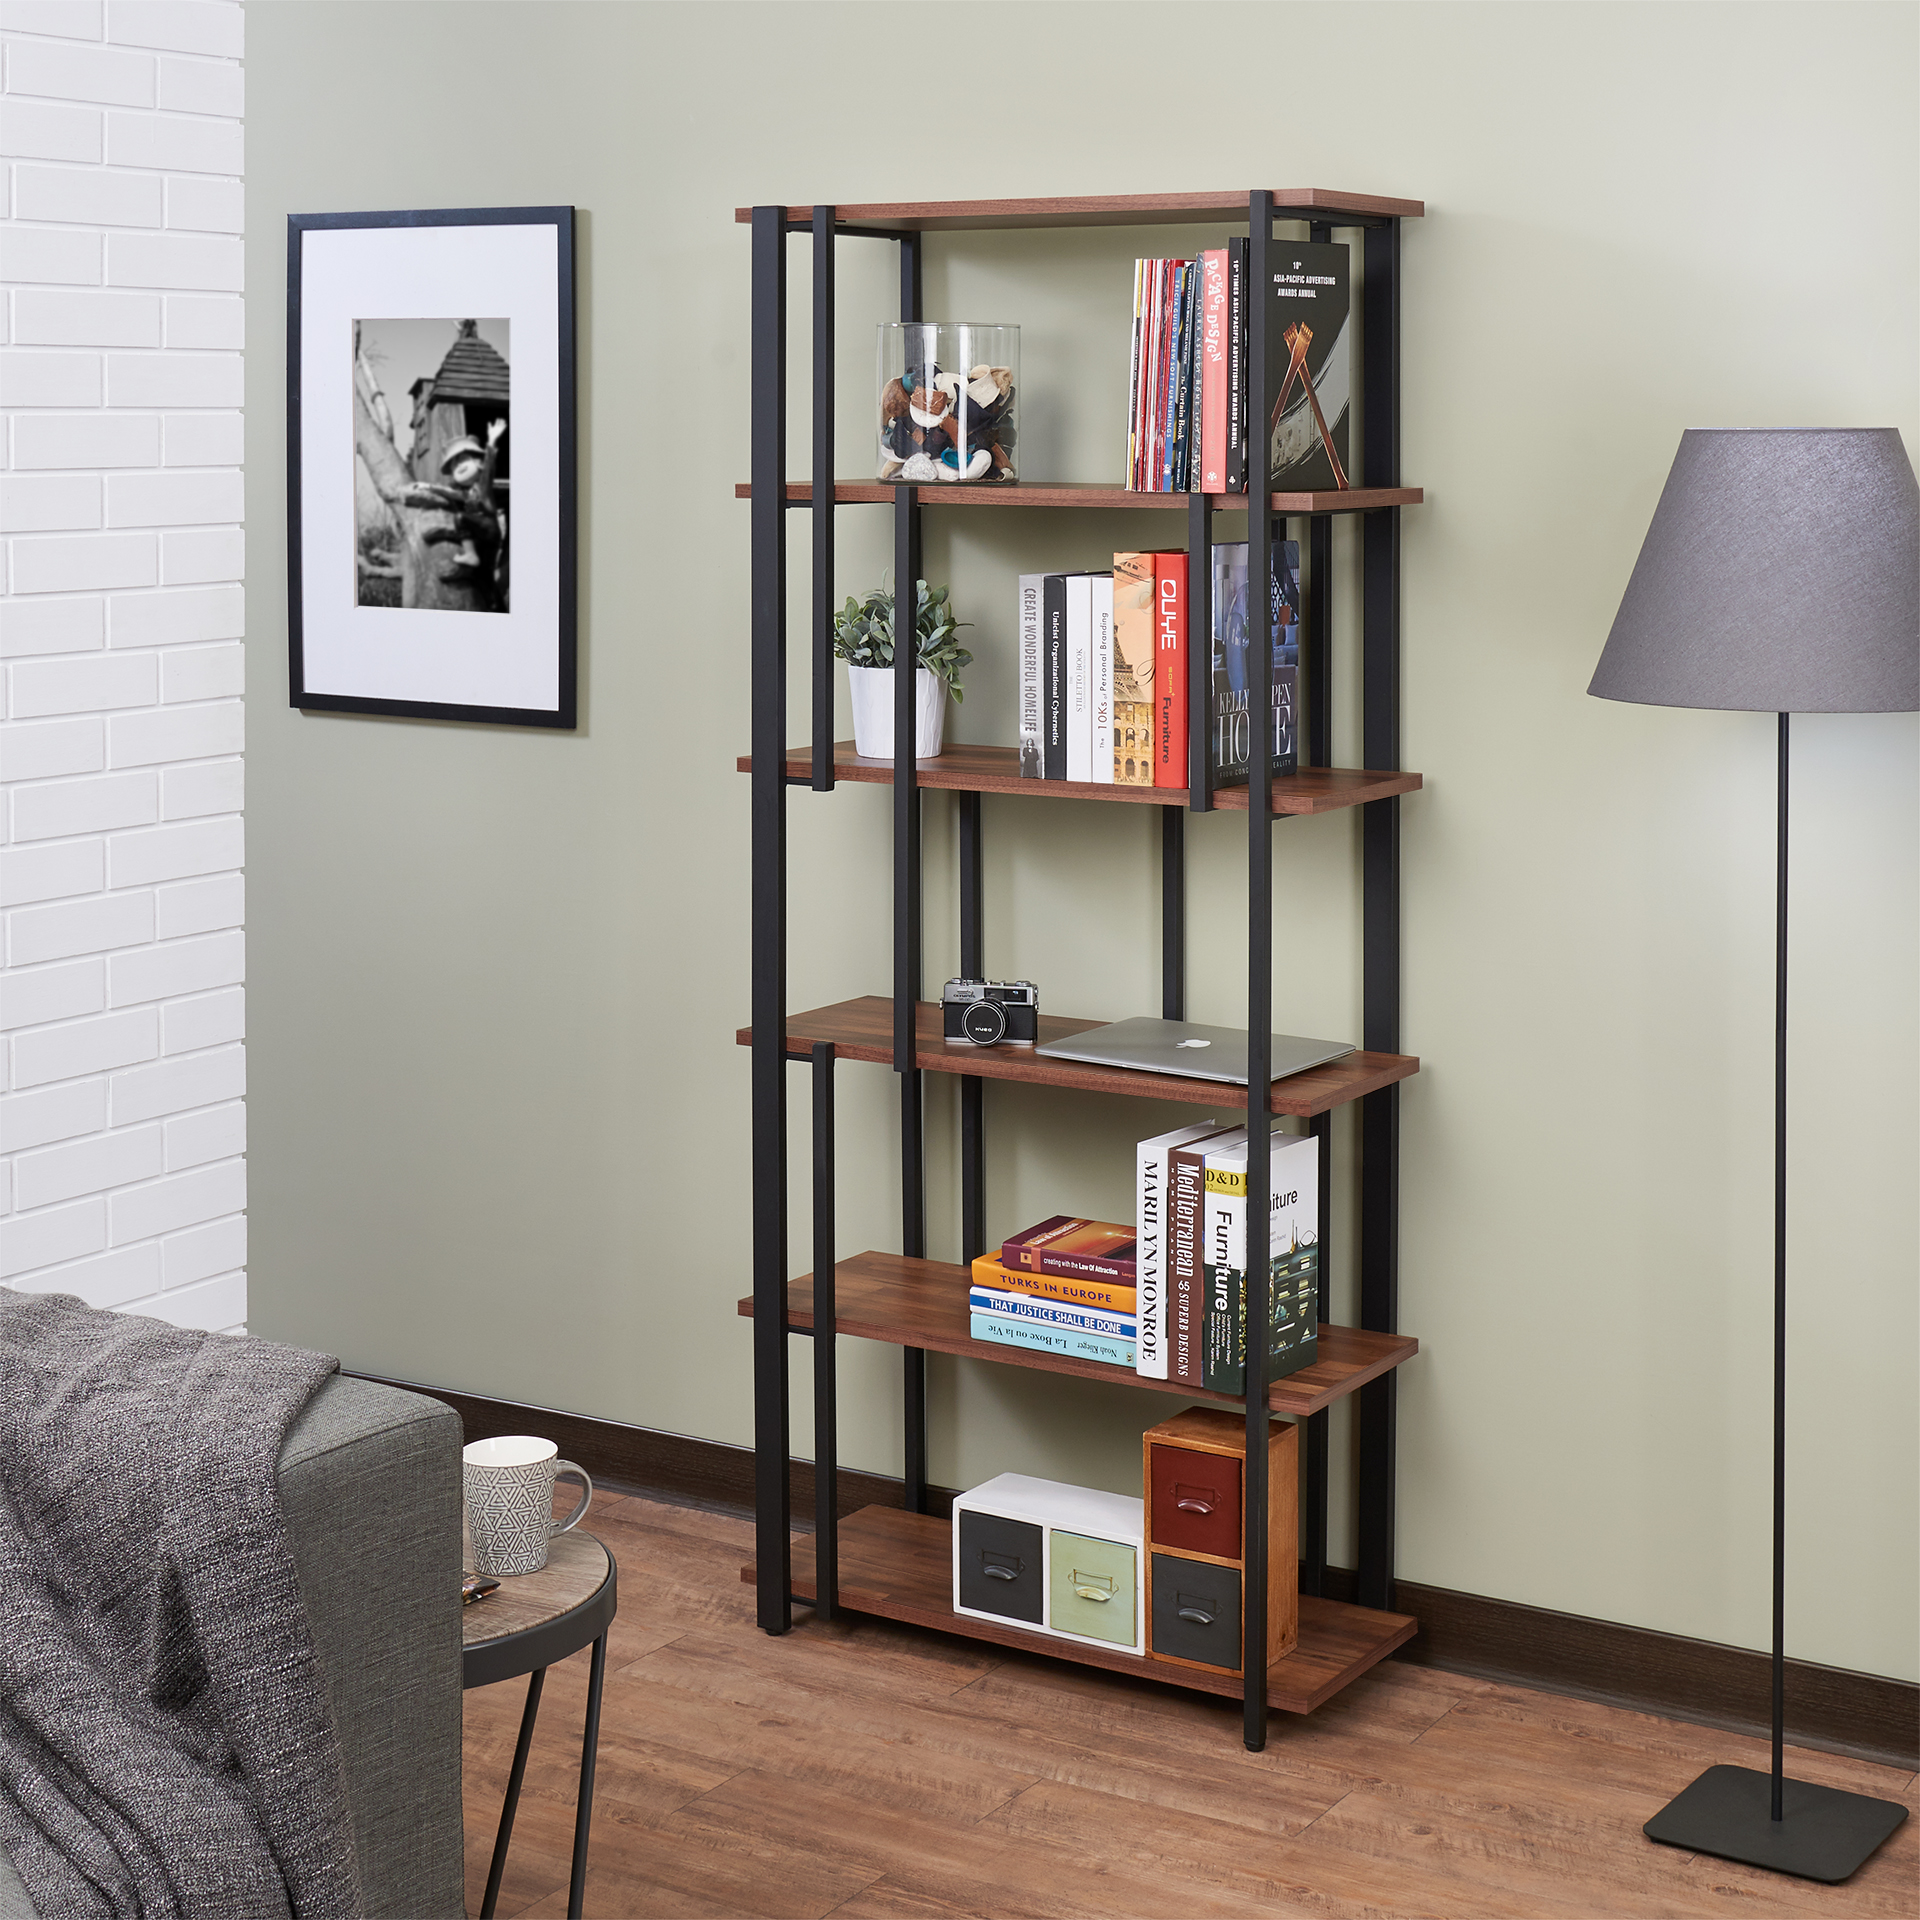 teak retro furniture vintage reclaimed teak retro industrial style bookcase dark office and home living room furniture